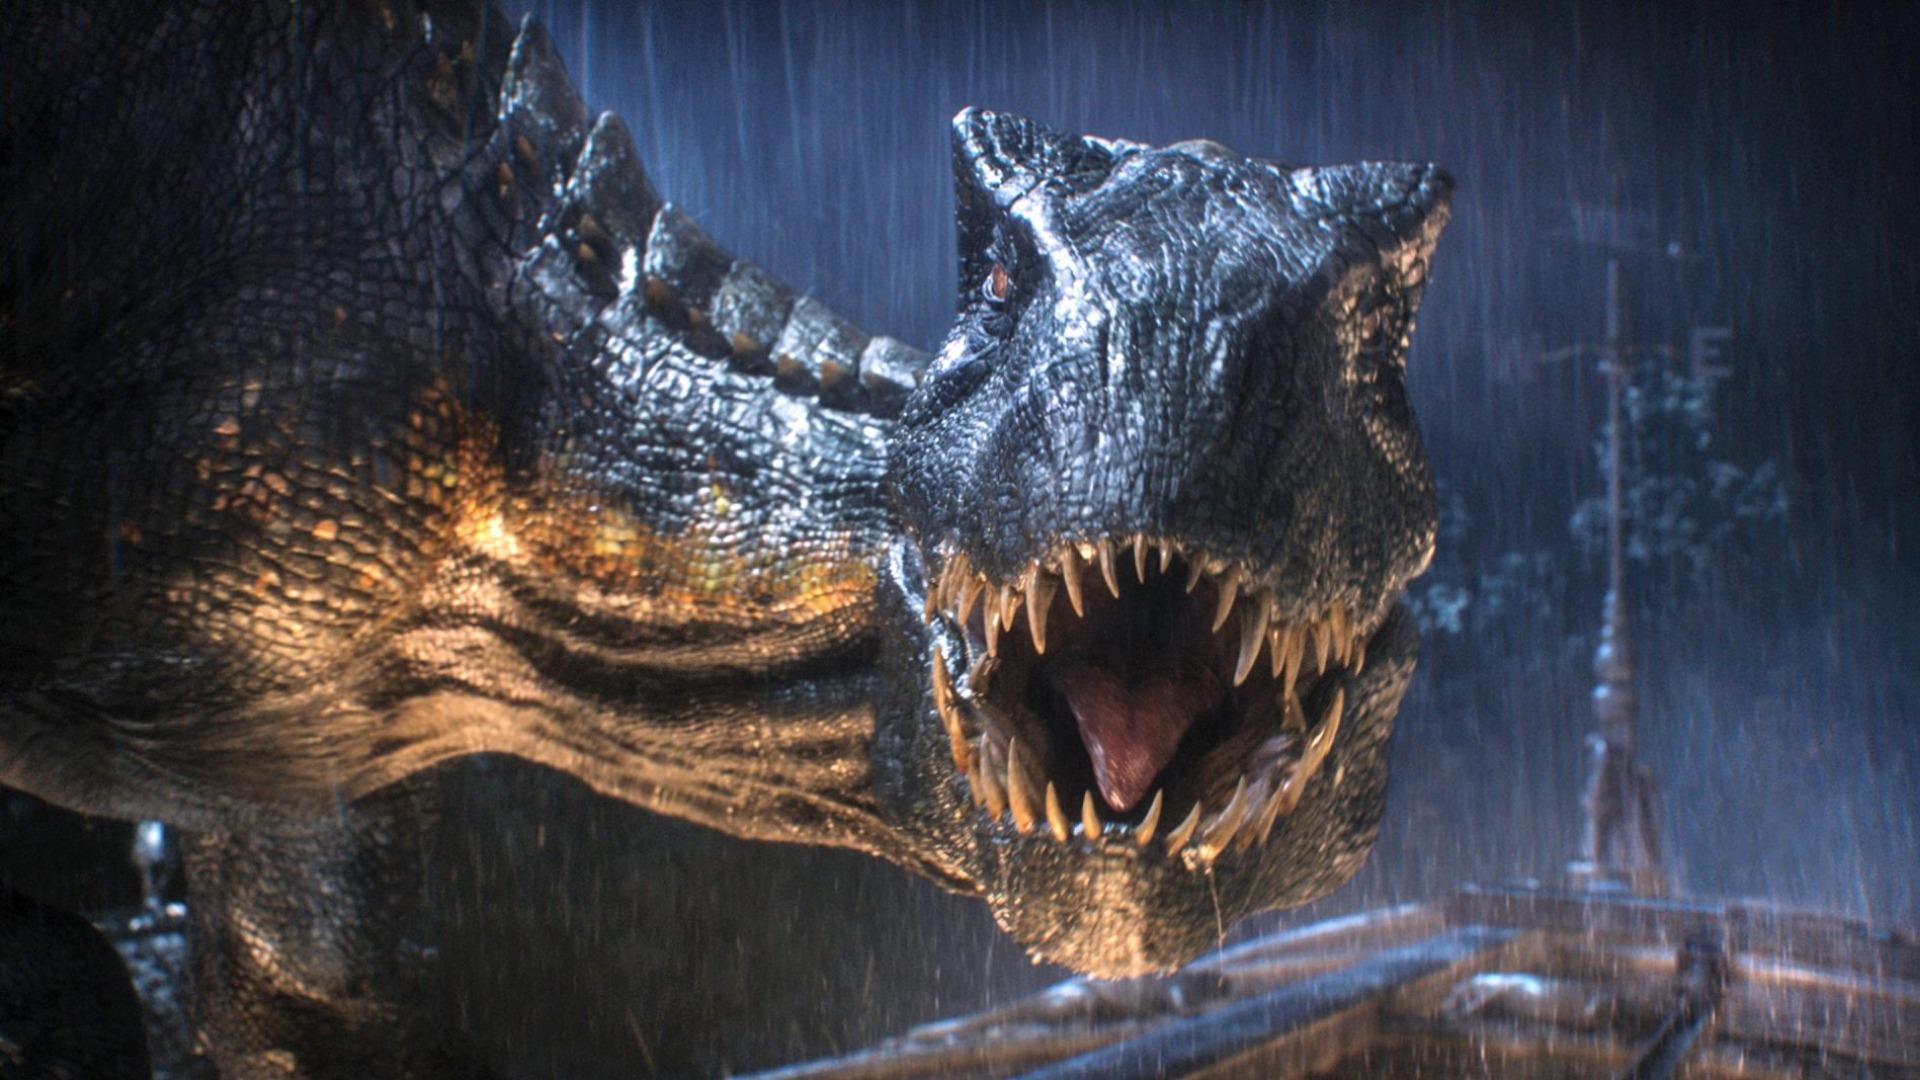 Jurassic World 3: Dominion: release date, cast, plot, trailer, and more | GamesRadar+